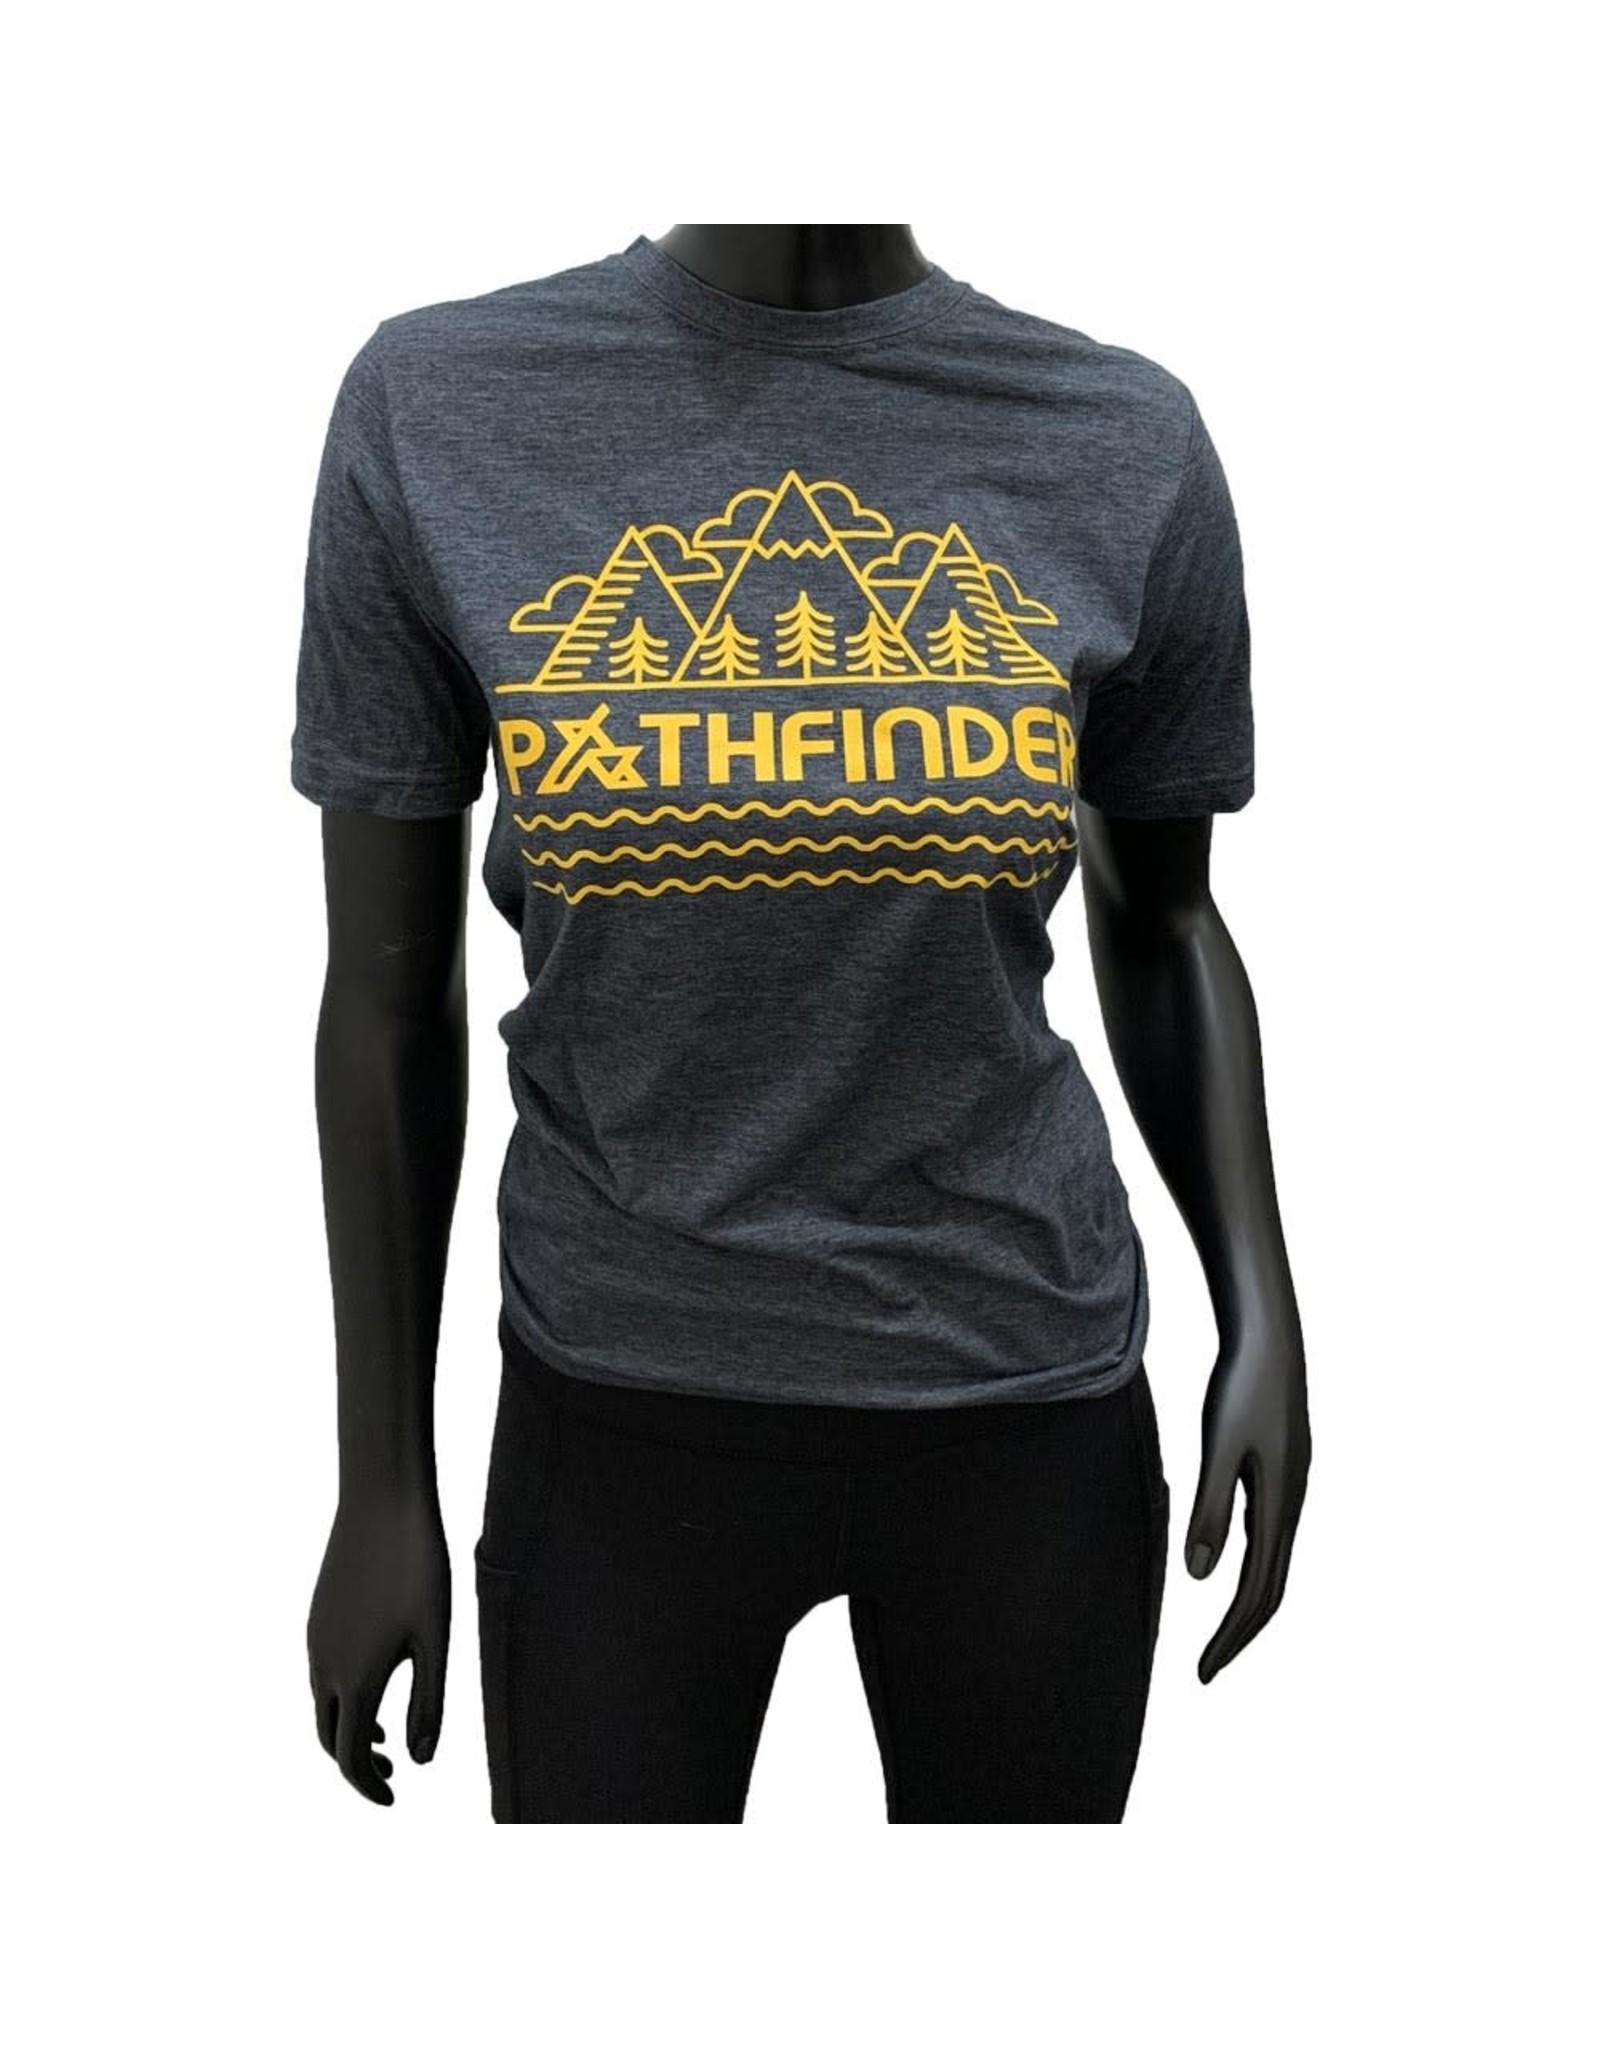 Pathfinder Linescape Crew Tee Antique Denim/Gold